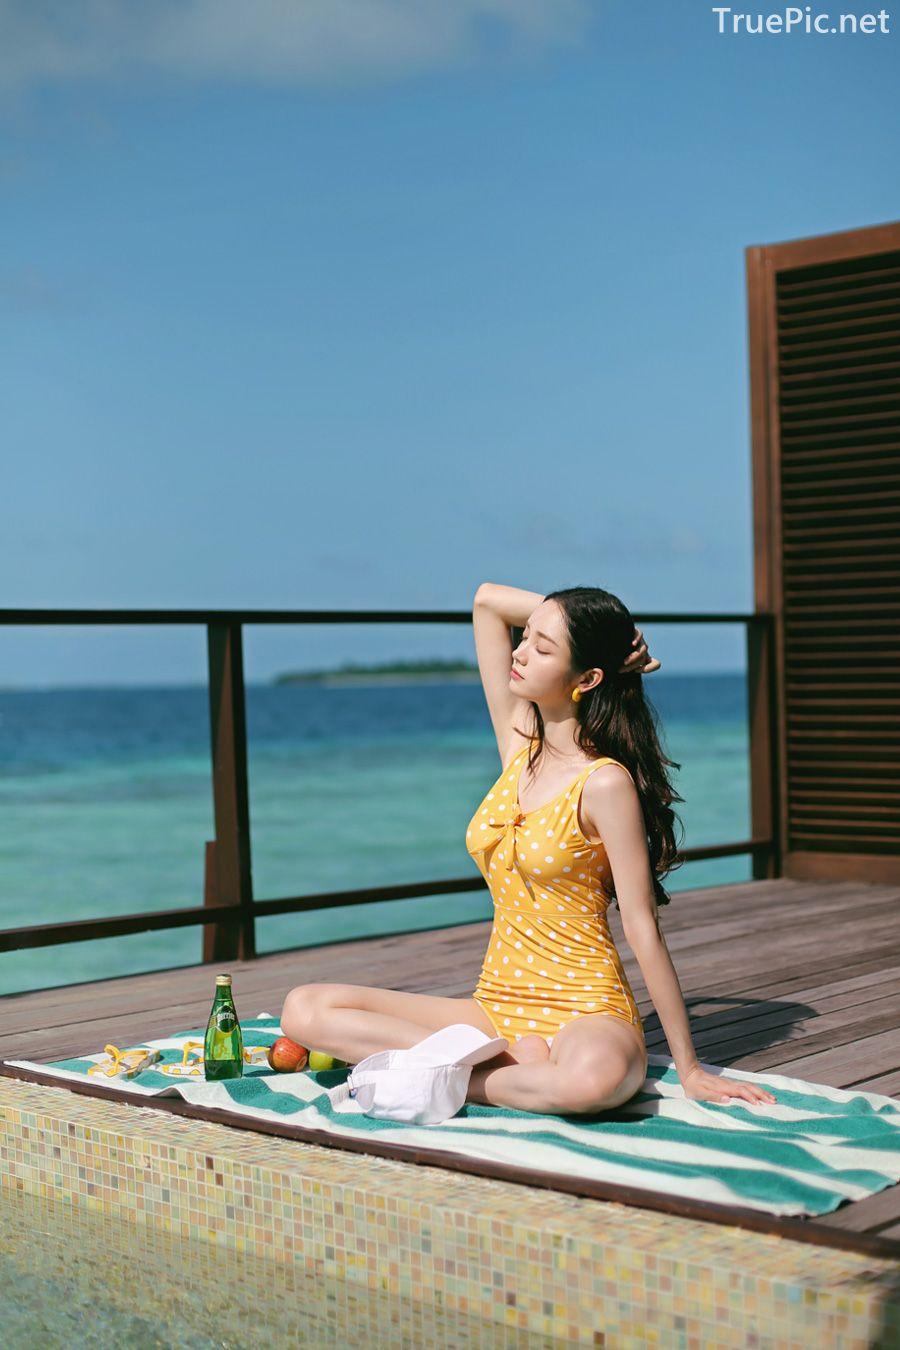 Korean fashion model Jeong Hee - Everyone once a monokini - Picture 9